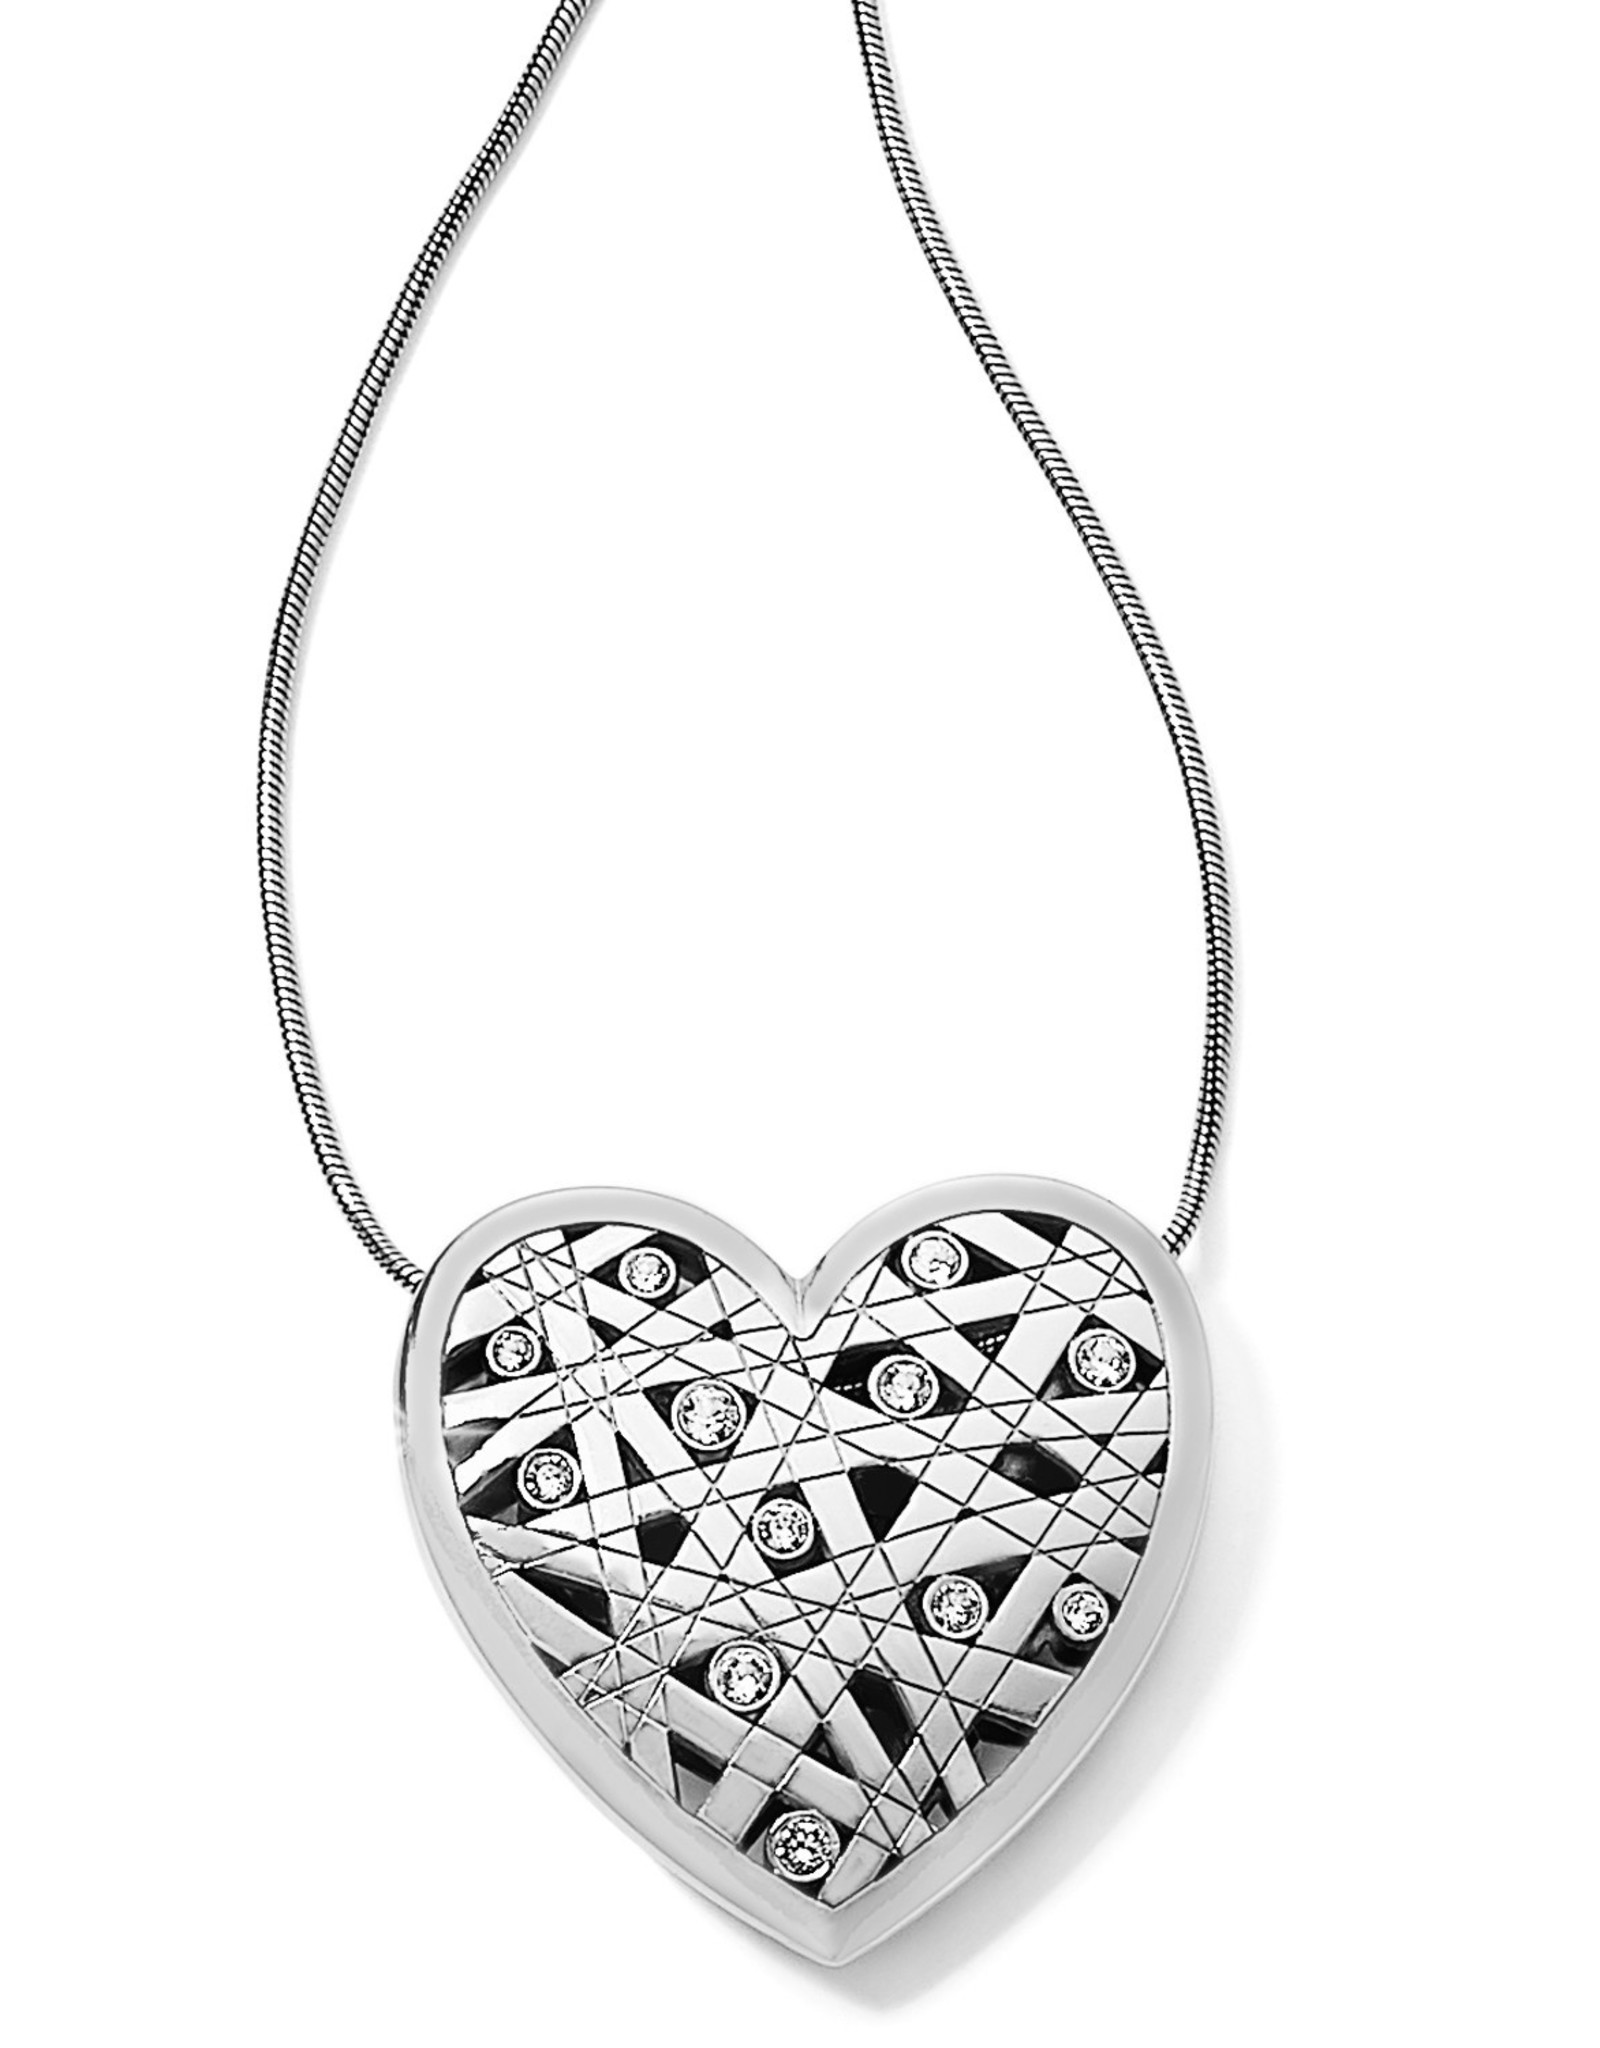 Brighton Brighton Necklace Nazca Heart